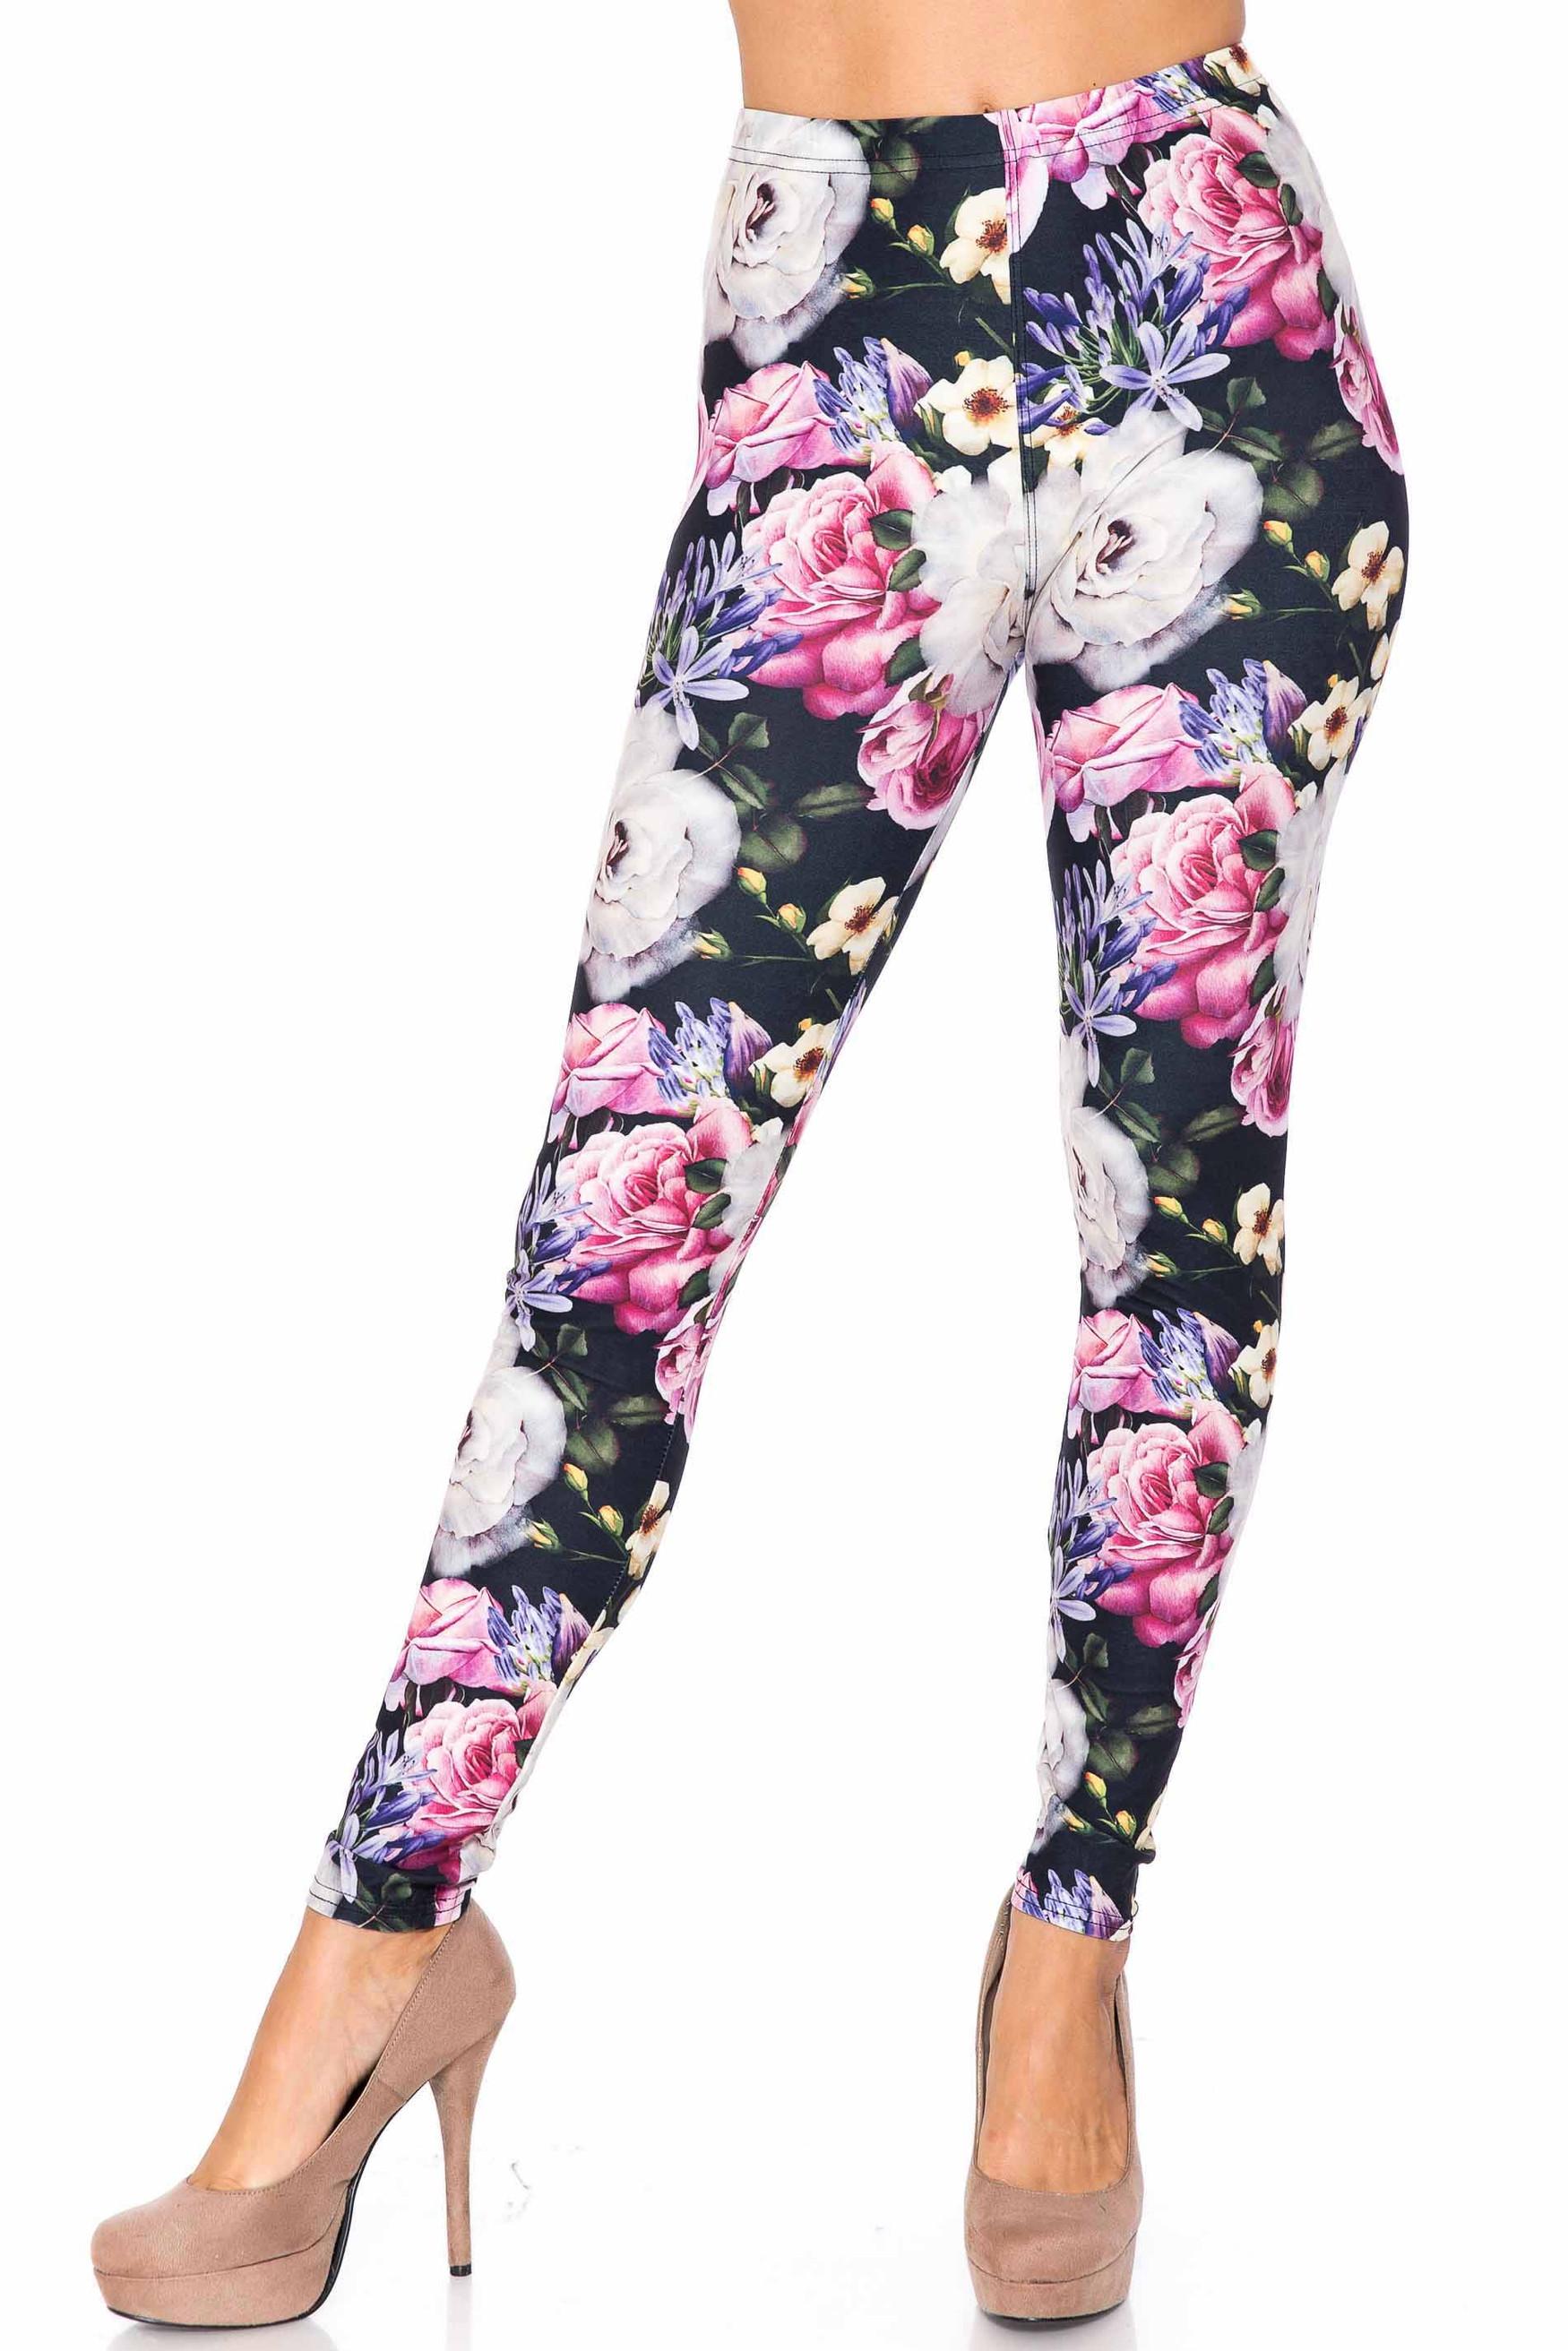 Creamy Soft Floral Garden Bouquet Plus Size Leggings - USA Fashion™